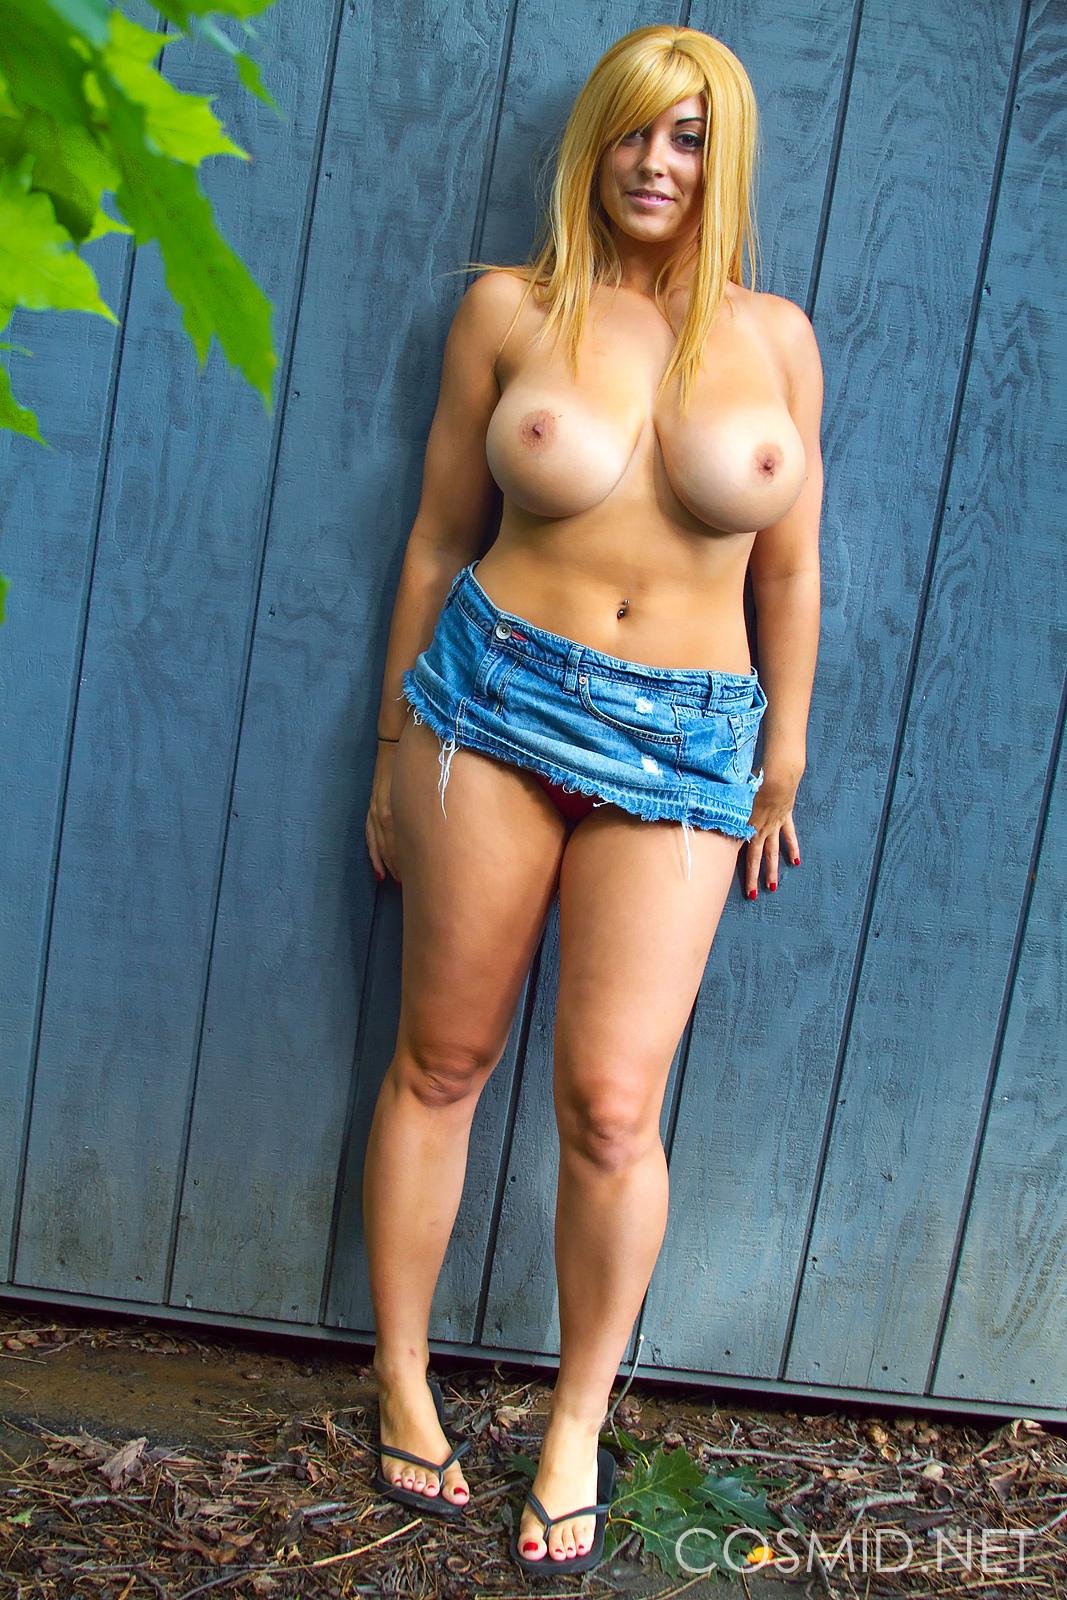 Tasha nude cosmid cole